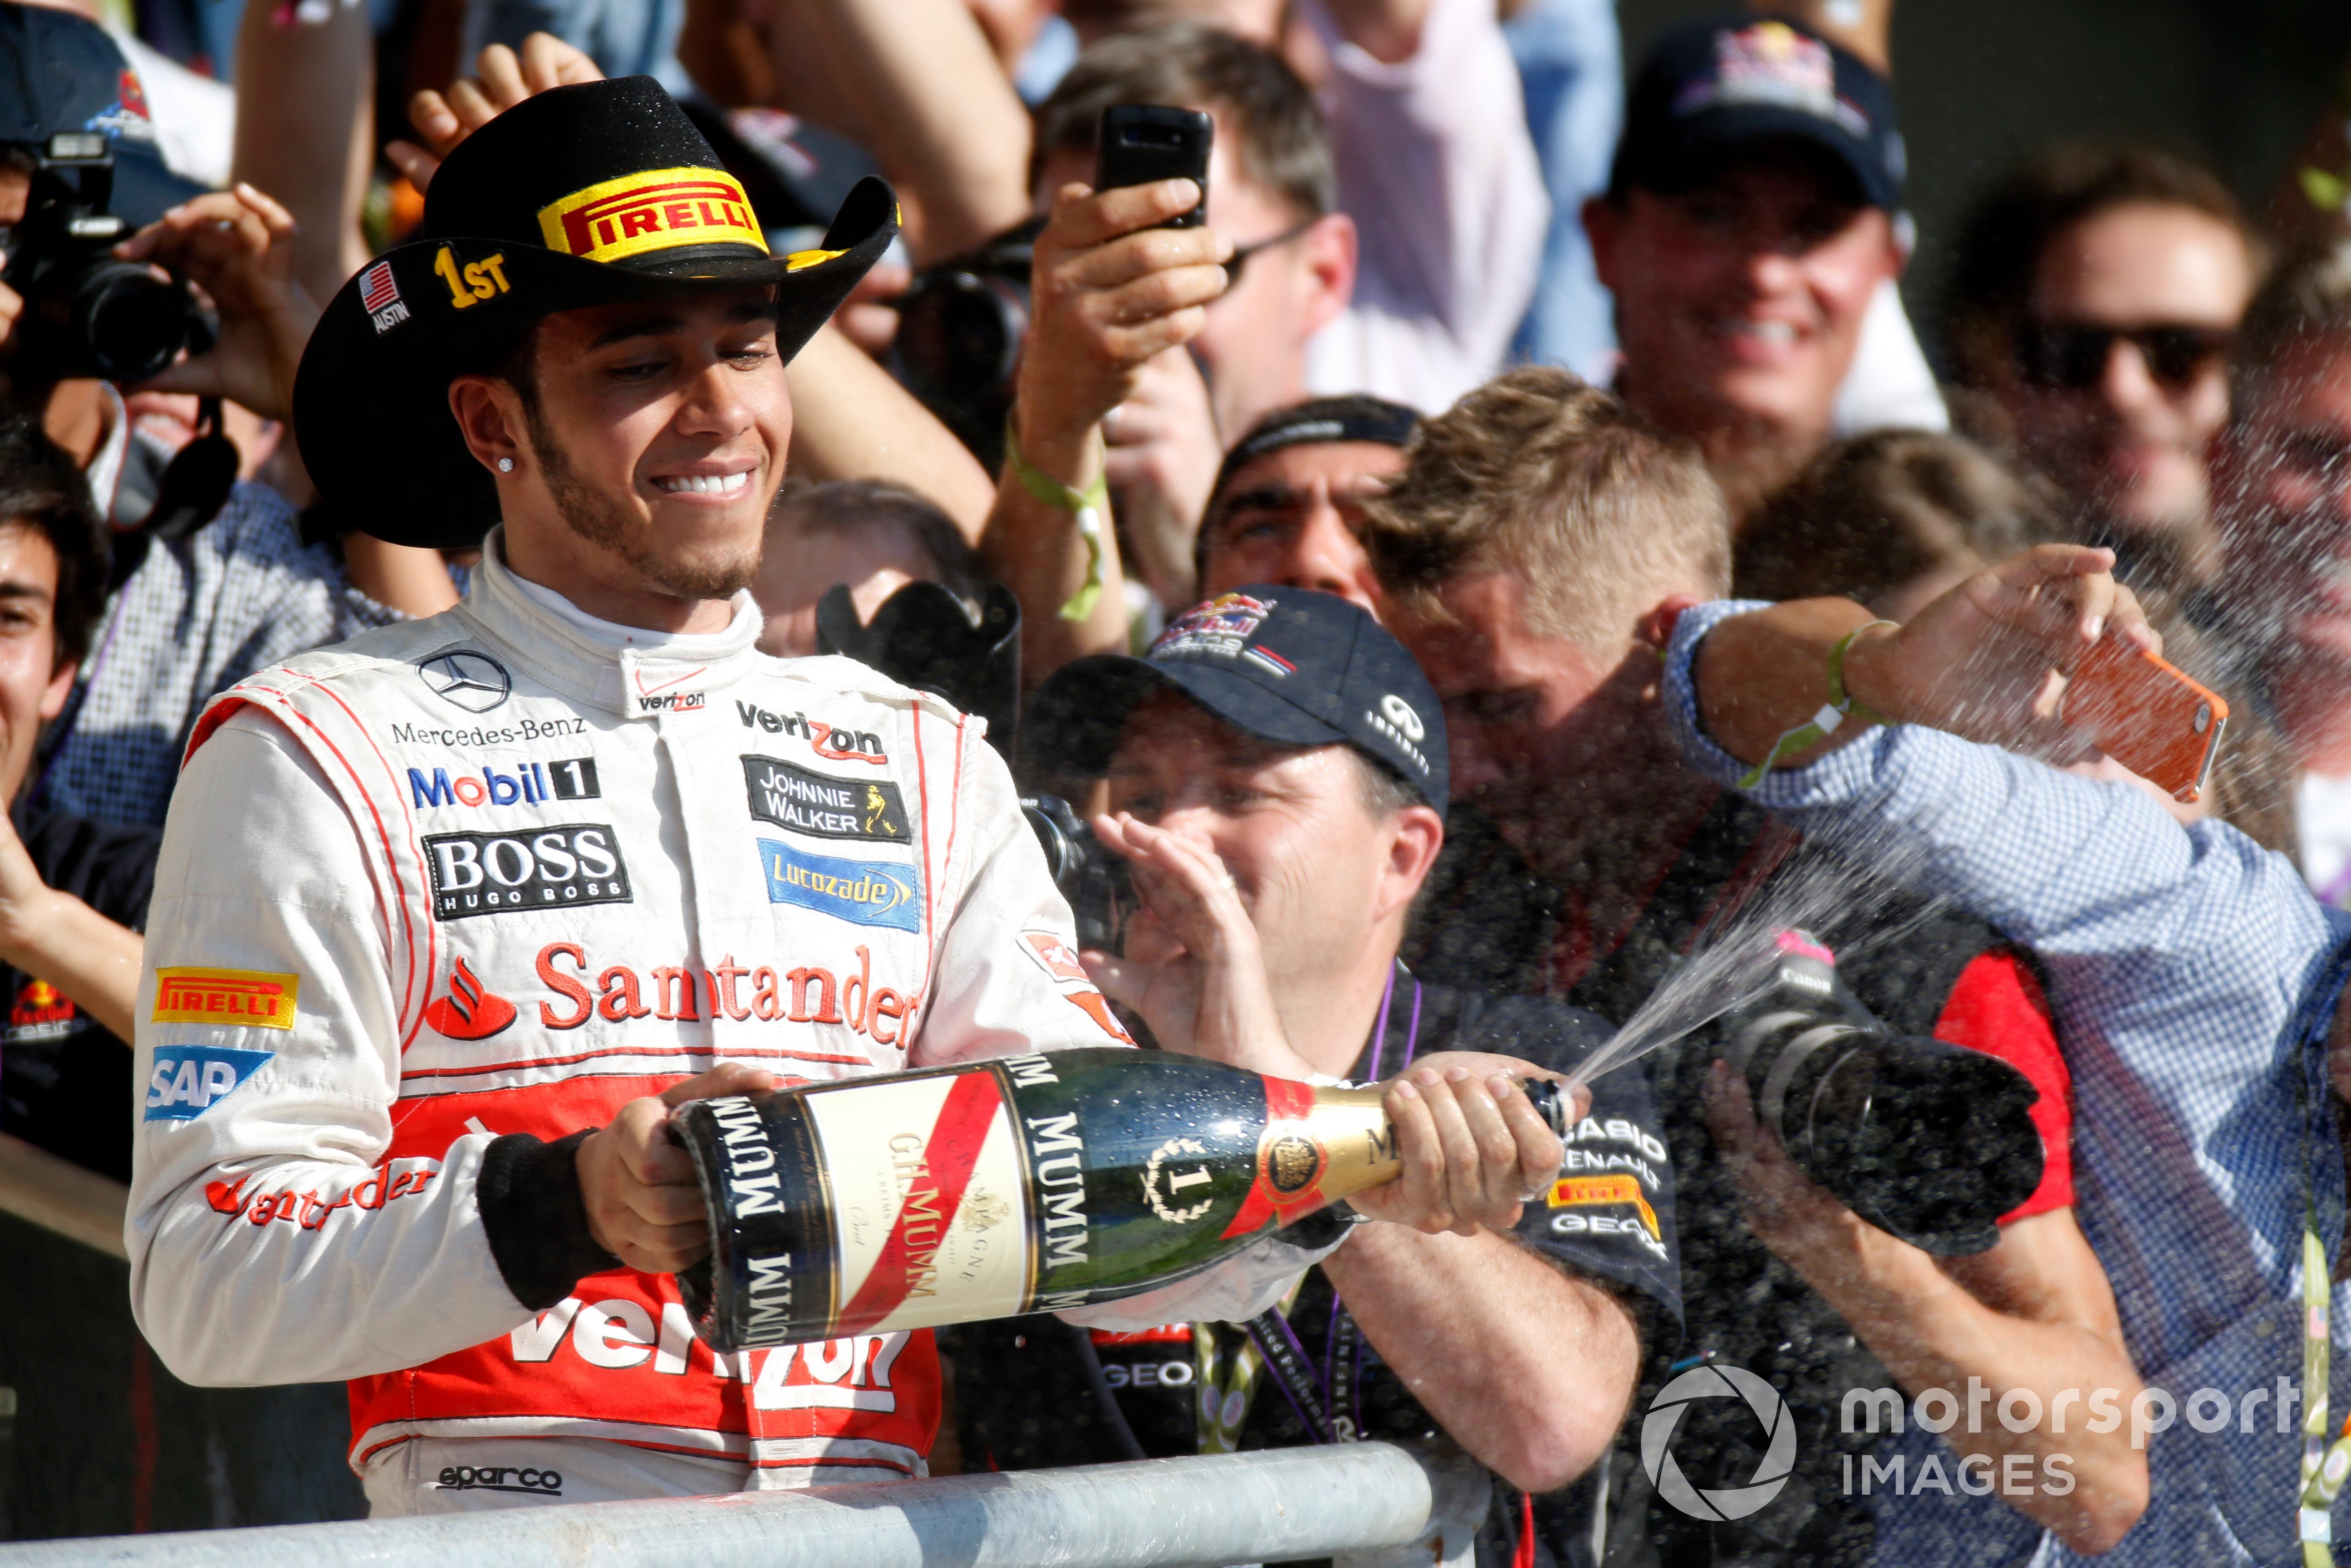 Lewis Hamilton, 2012 United States GP